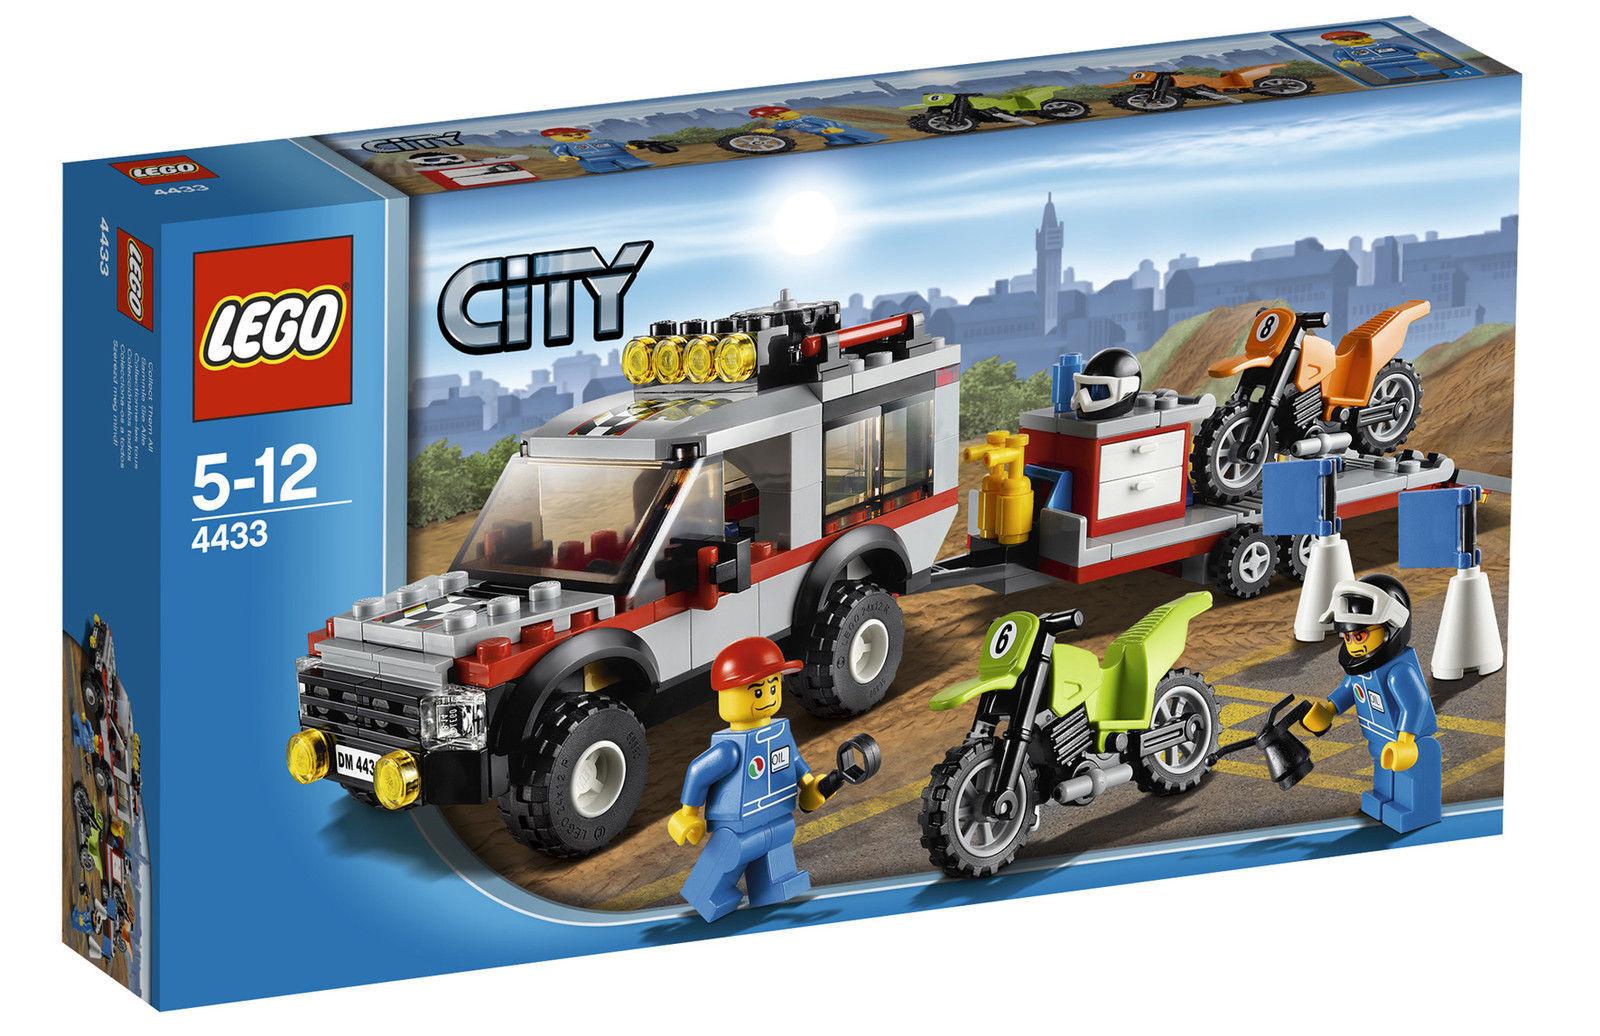 LEGO City Dirt Bike Transporter  4433